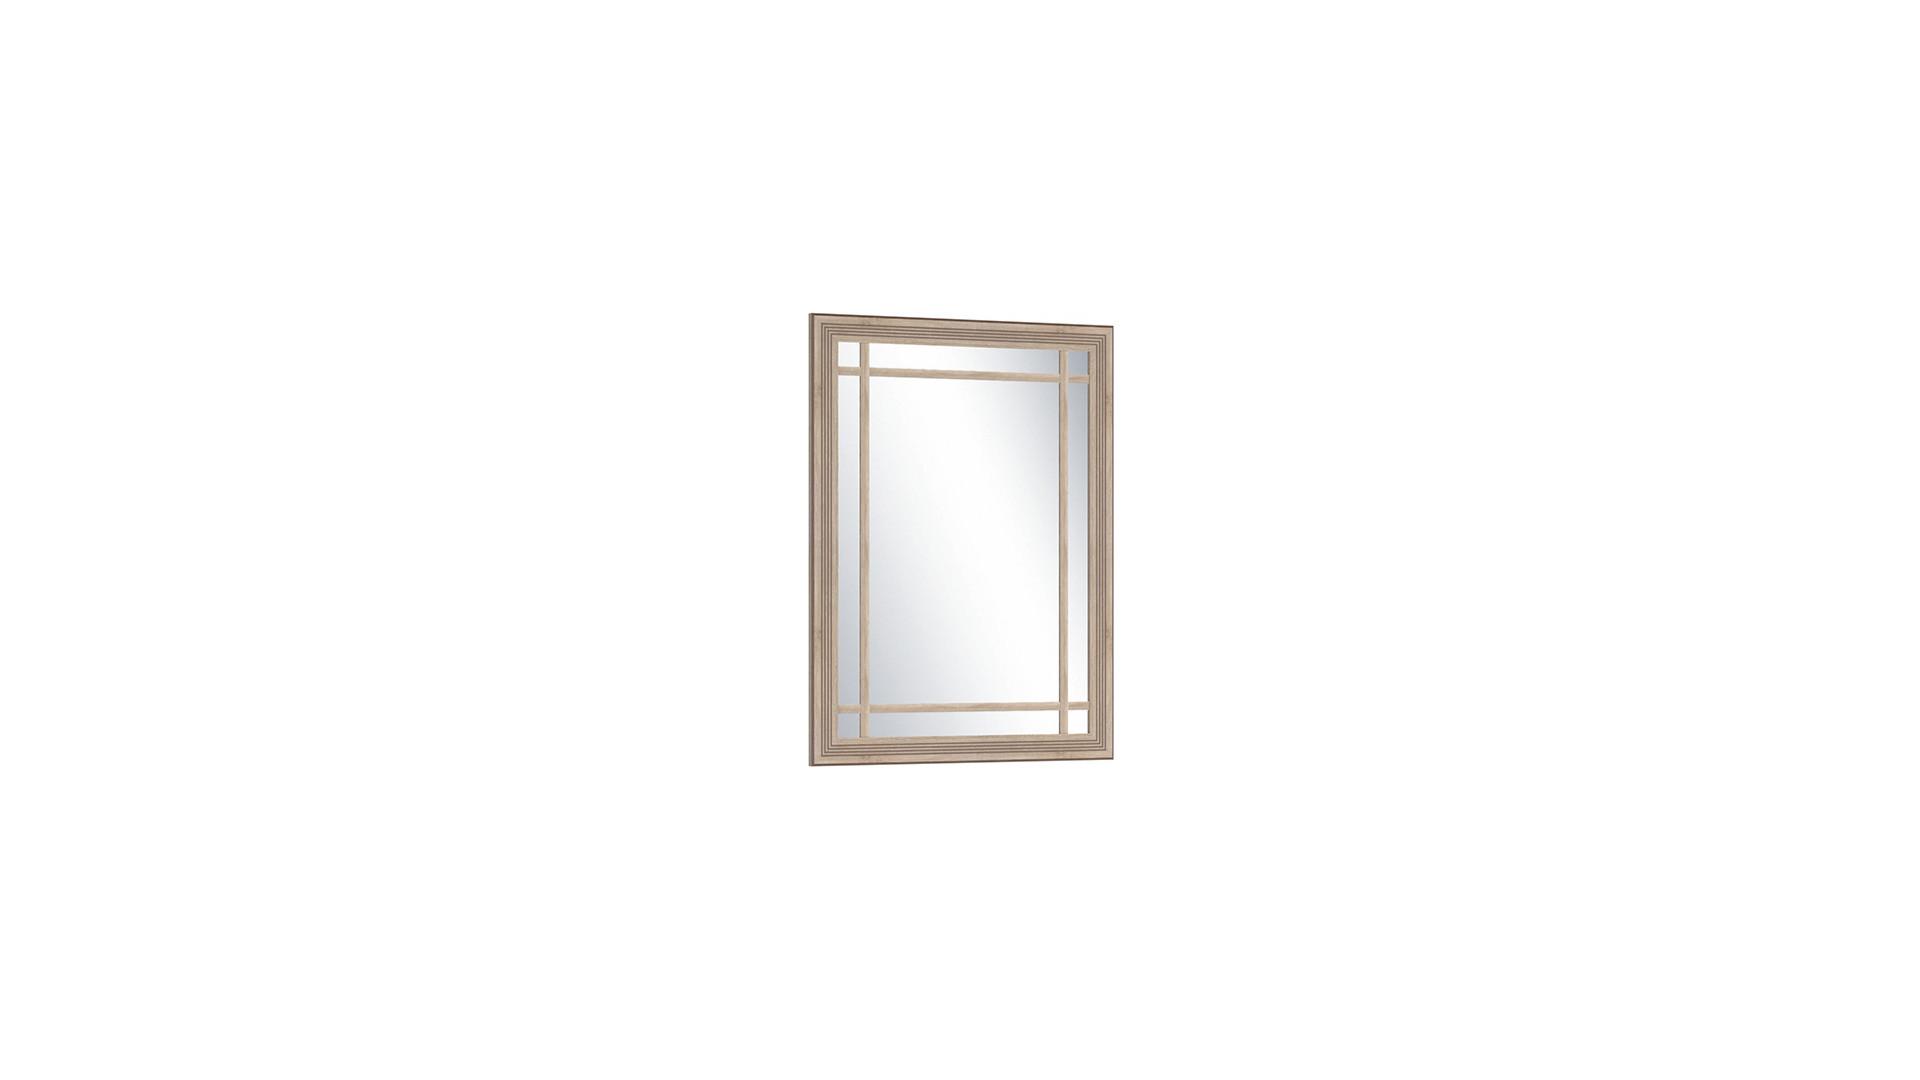 Зеркало большое  Бруно Дуб Сонома/Дуб Сонома Светлый